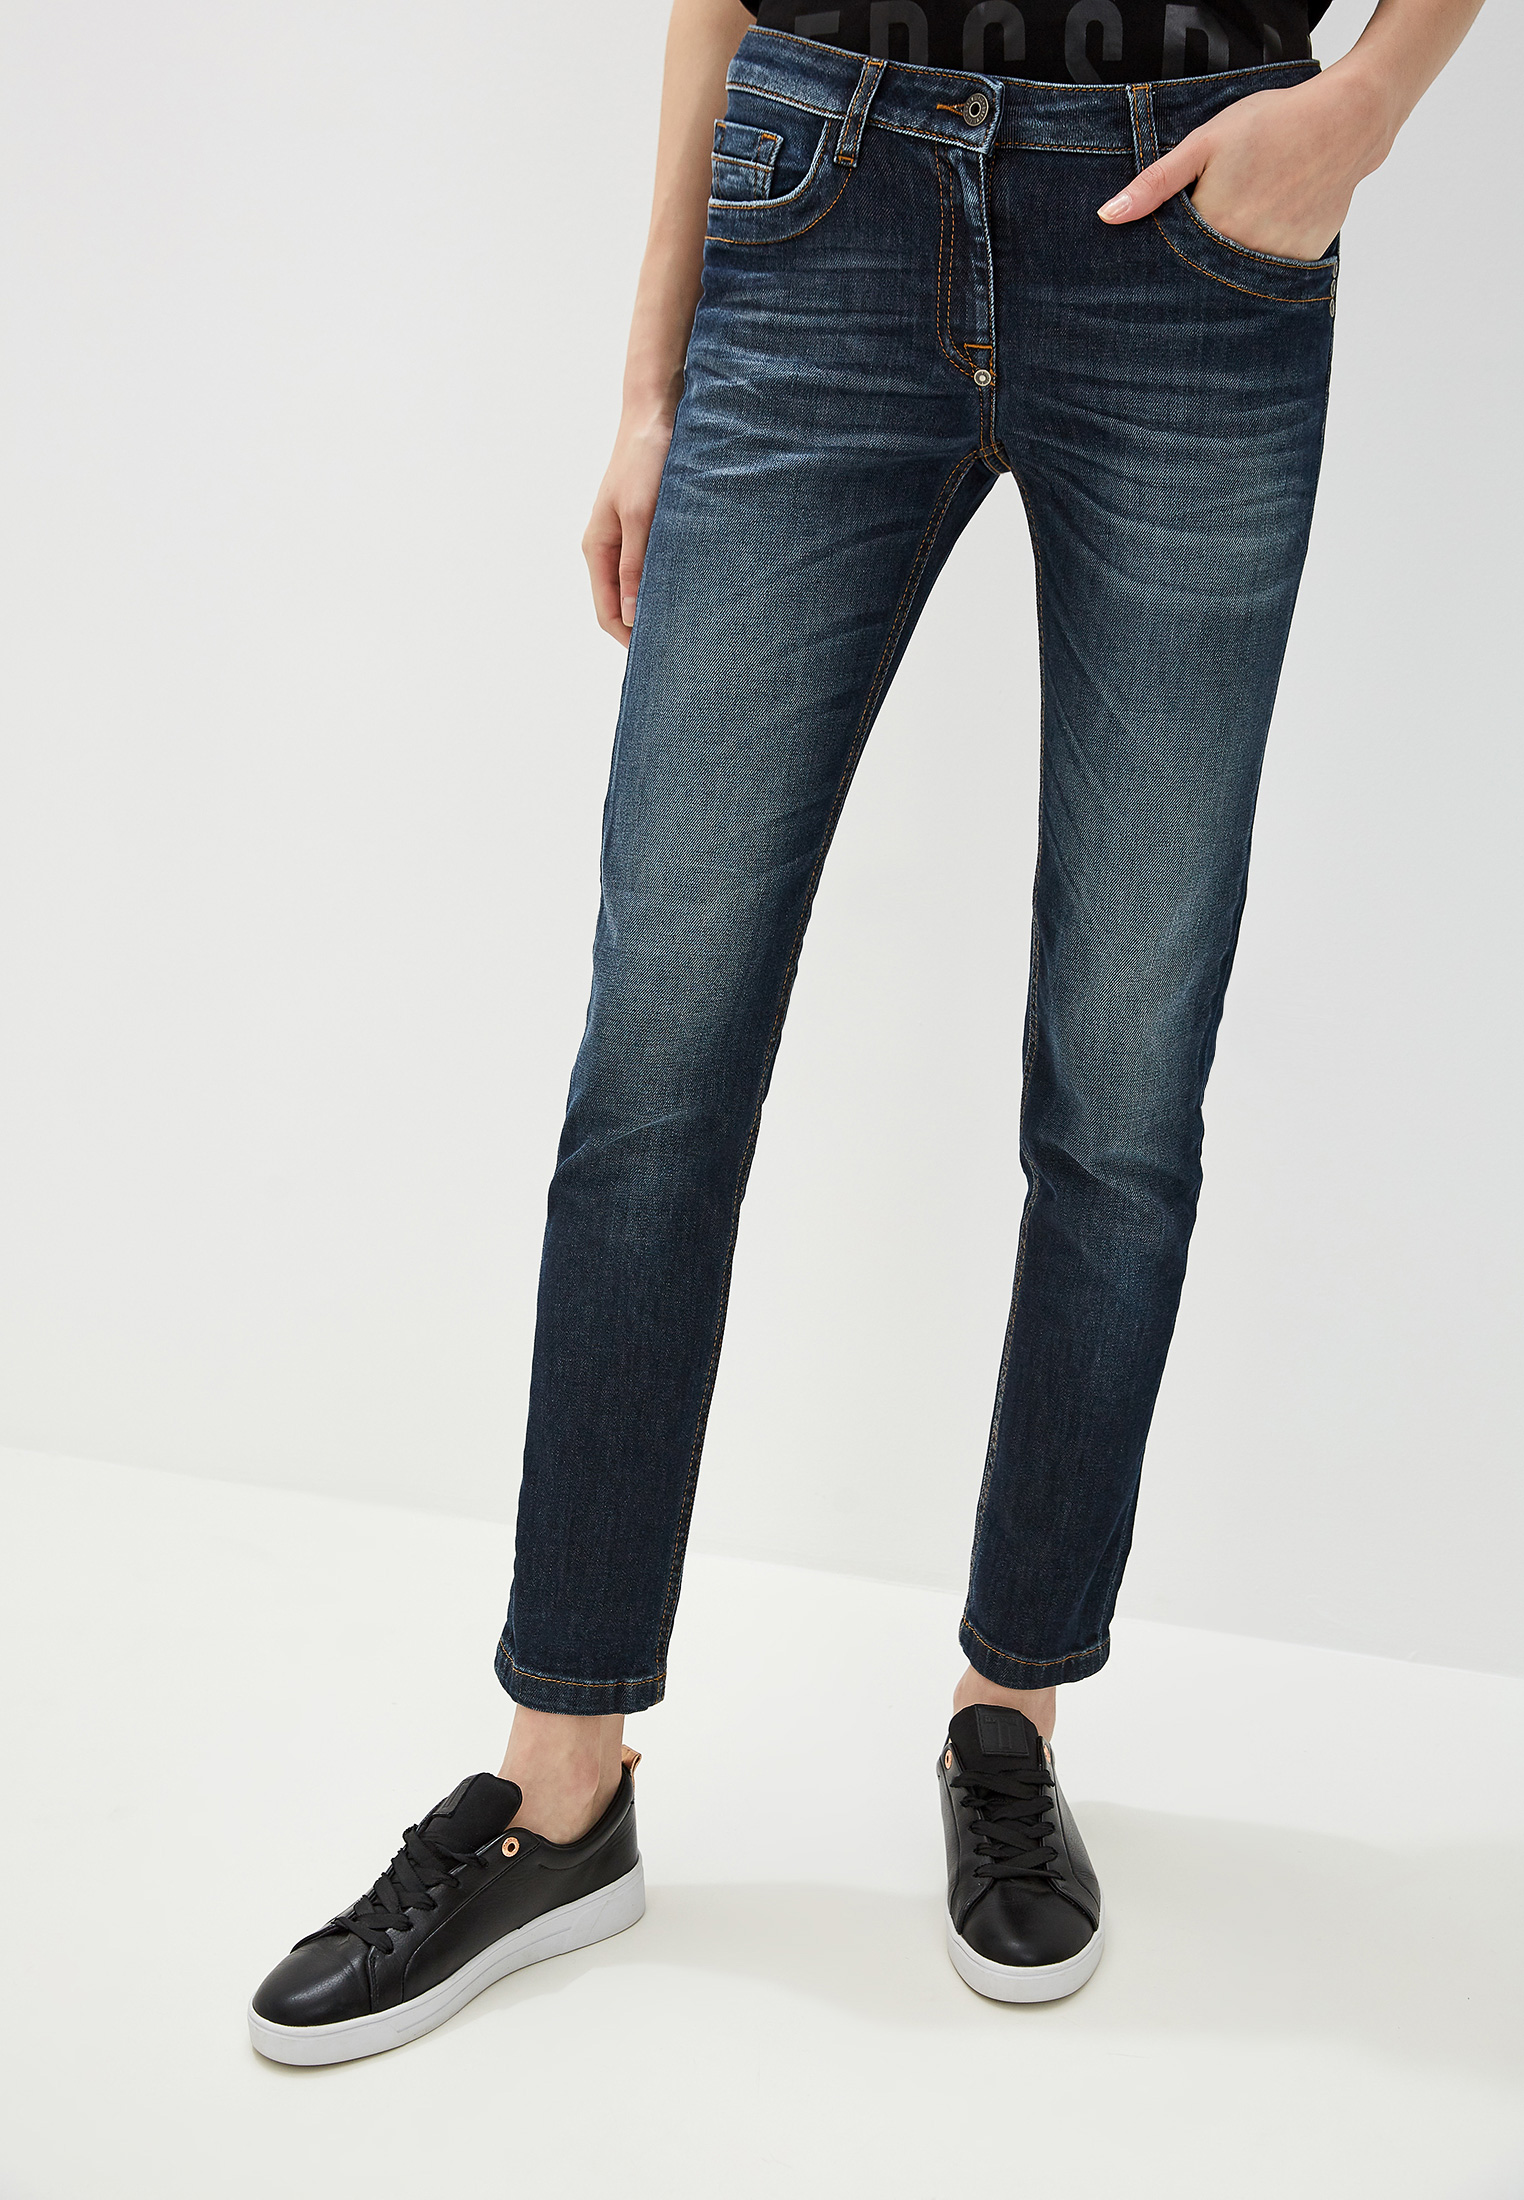 Зауженные джинсы Bikkembergs D Q 101 01 S 3333